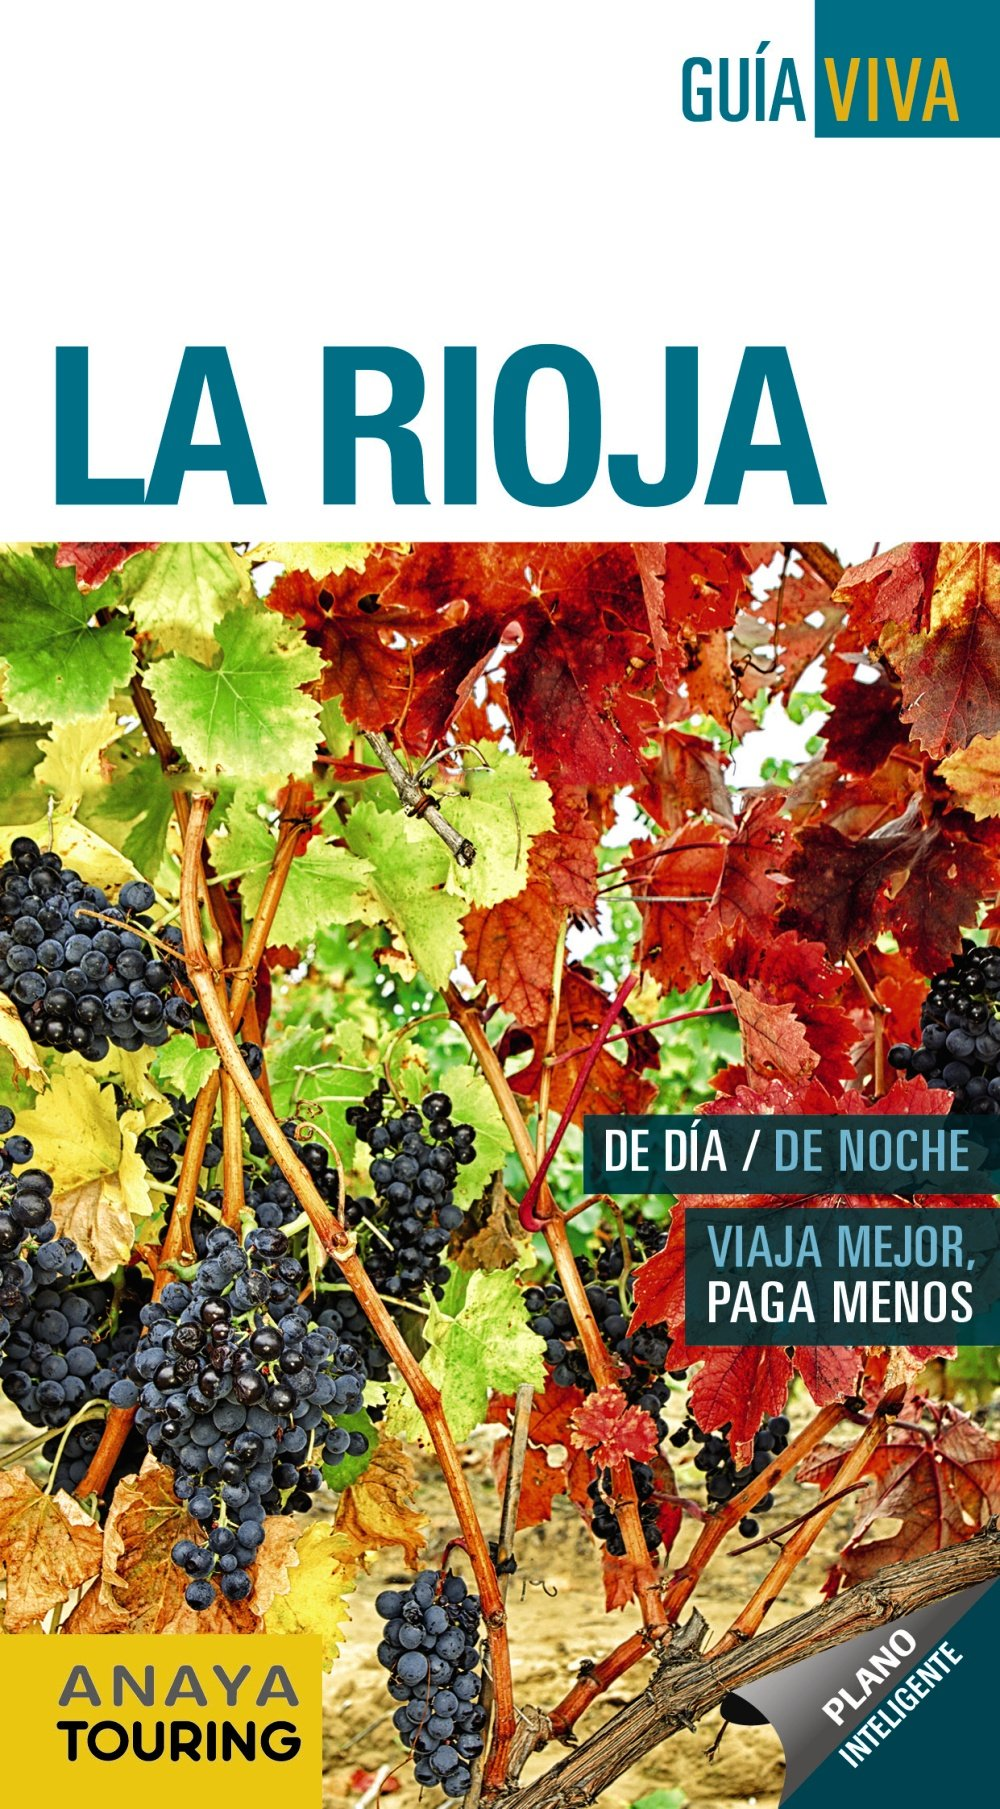 La Rioja (Guía Viva - España): Amazon.es: Anaya Touring, Ramos ...